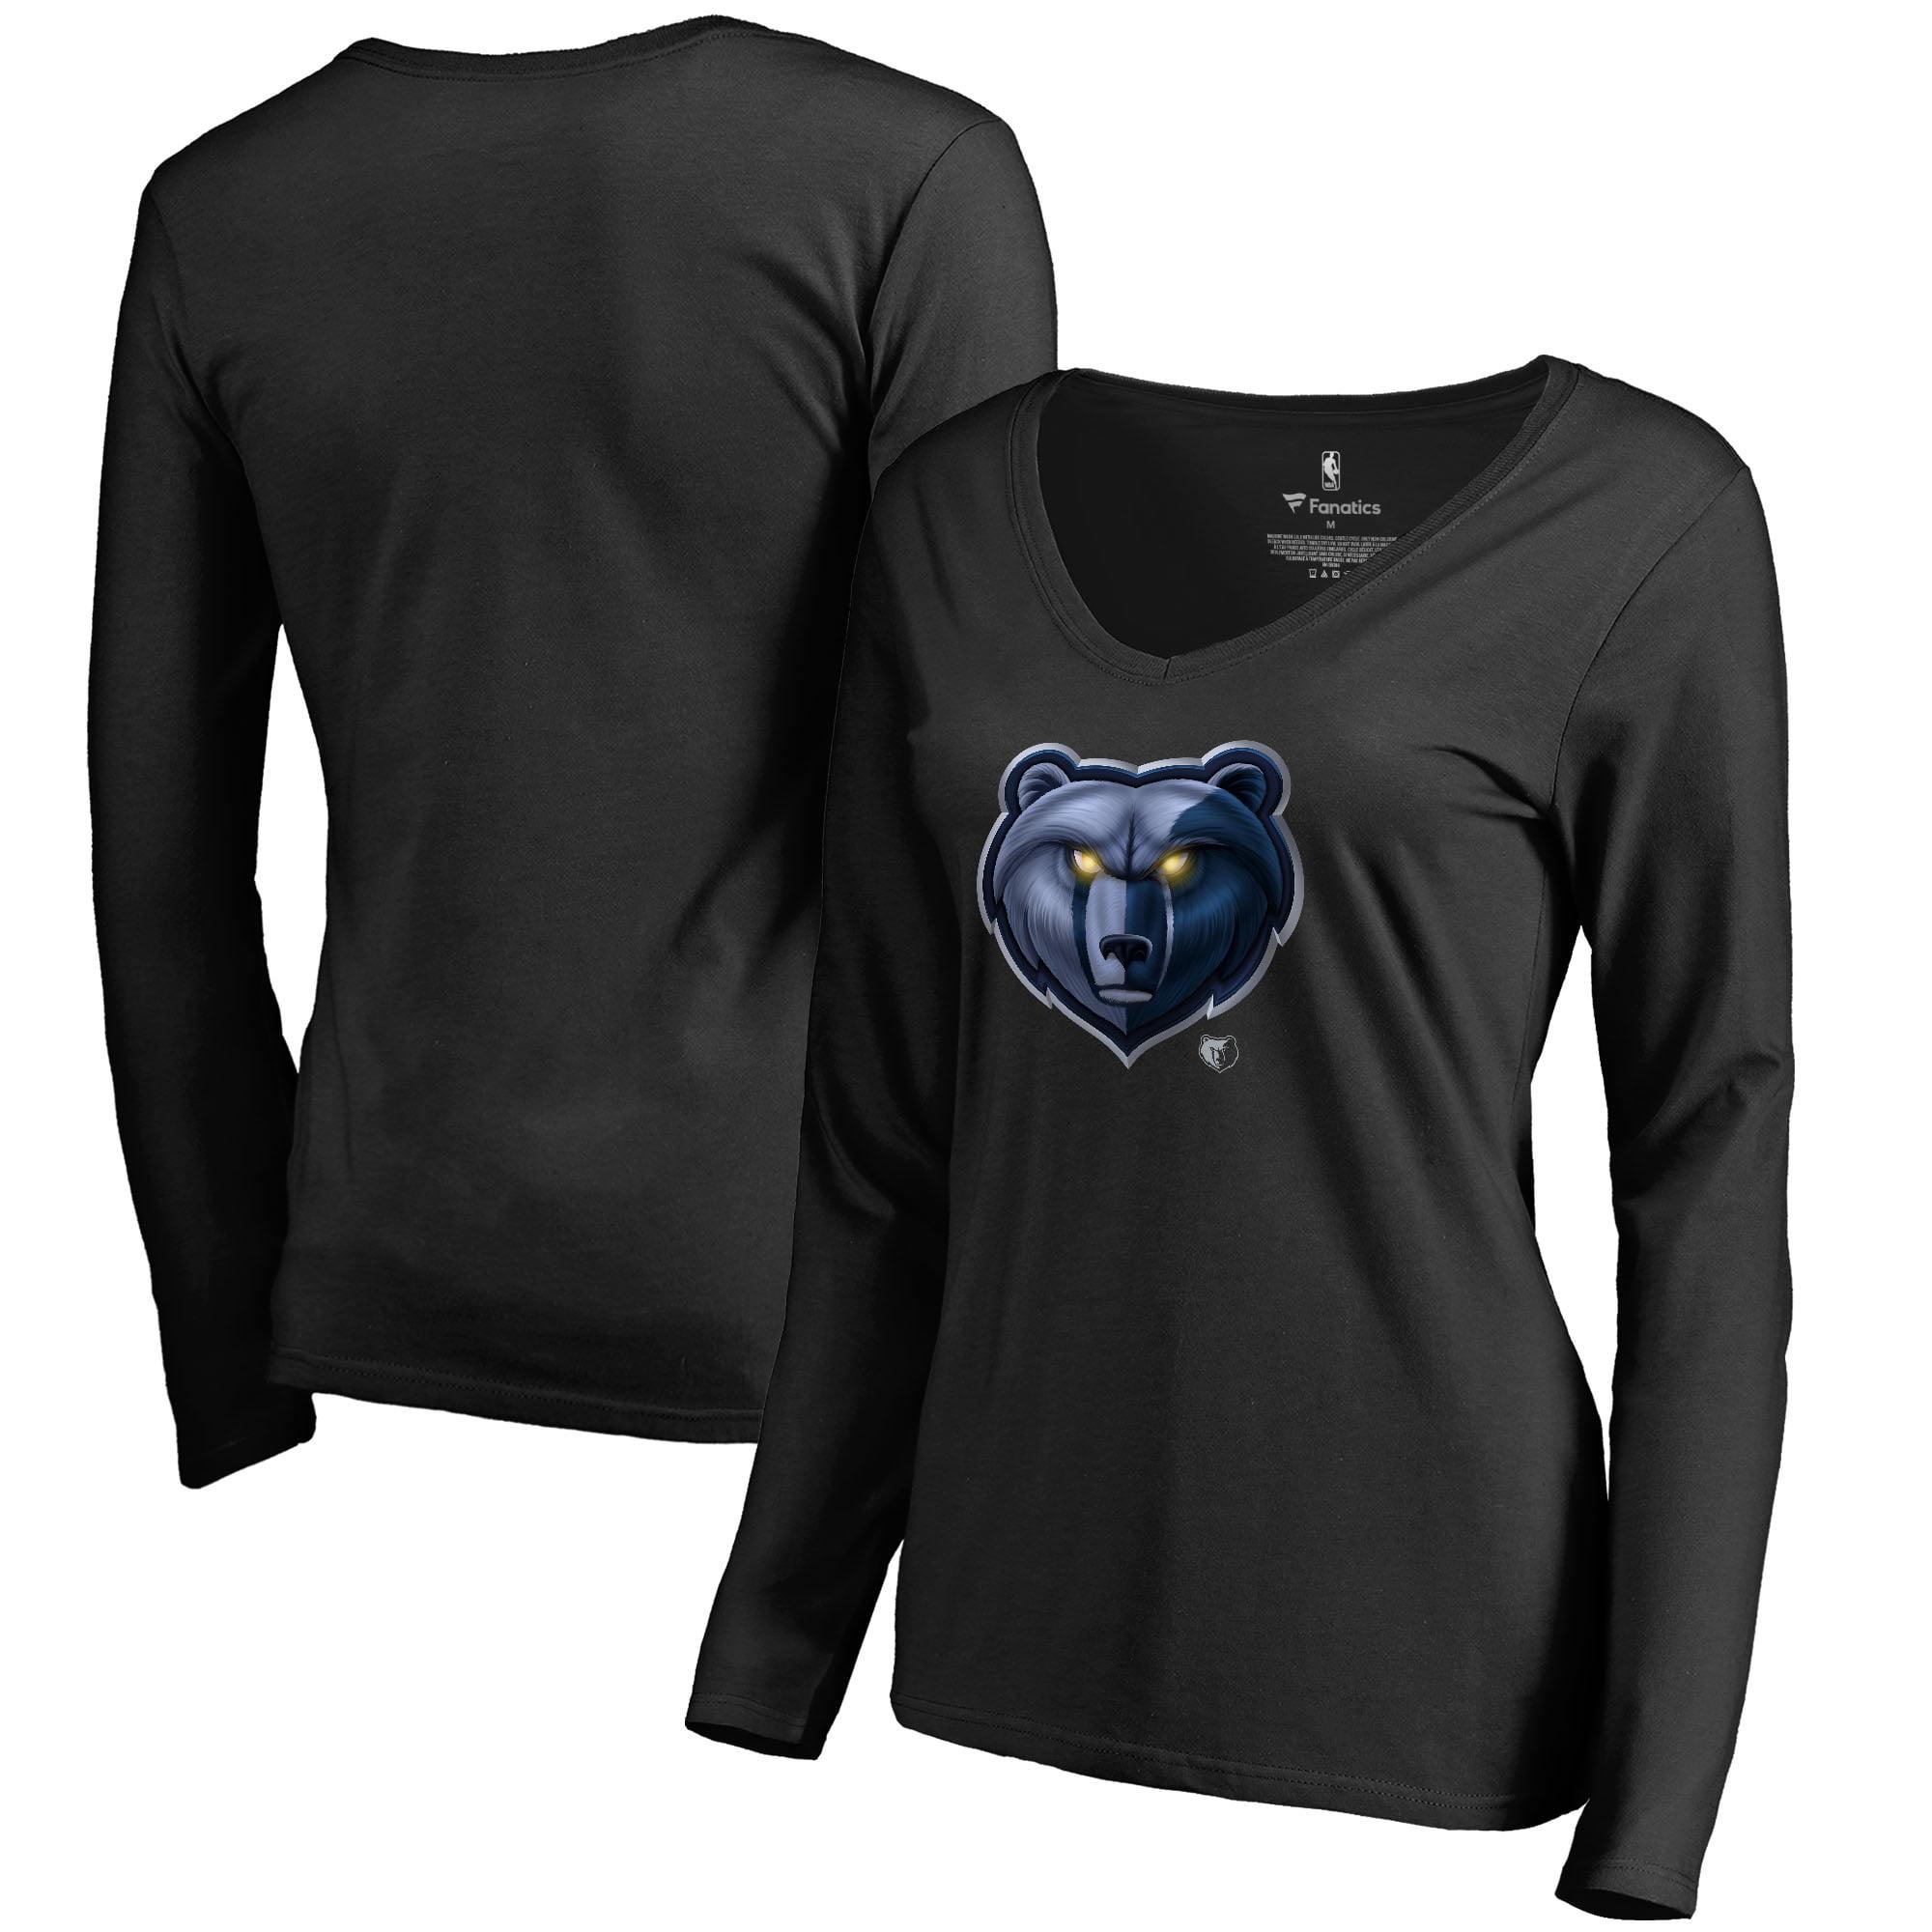 Memphis Grizzlies Fanatics Branded Women's Midnight Mascot Long Sleeve V-Neck T-Shirt - Black